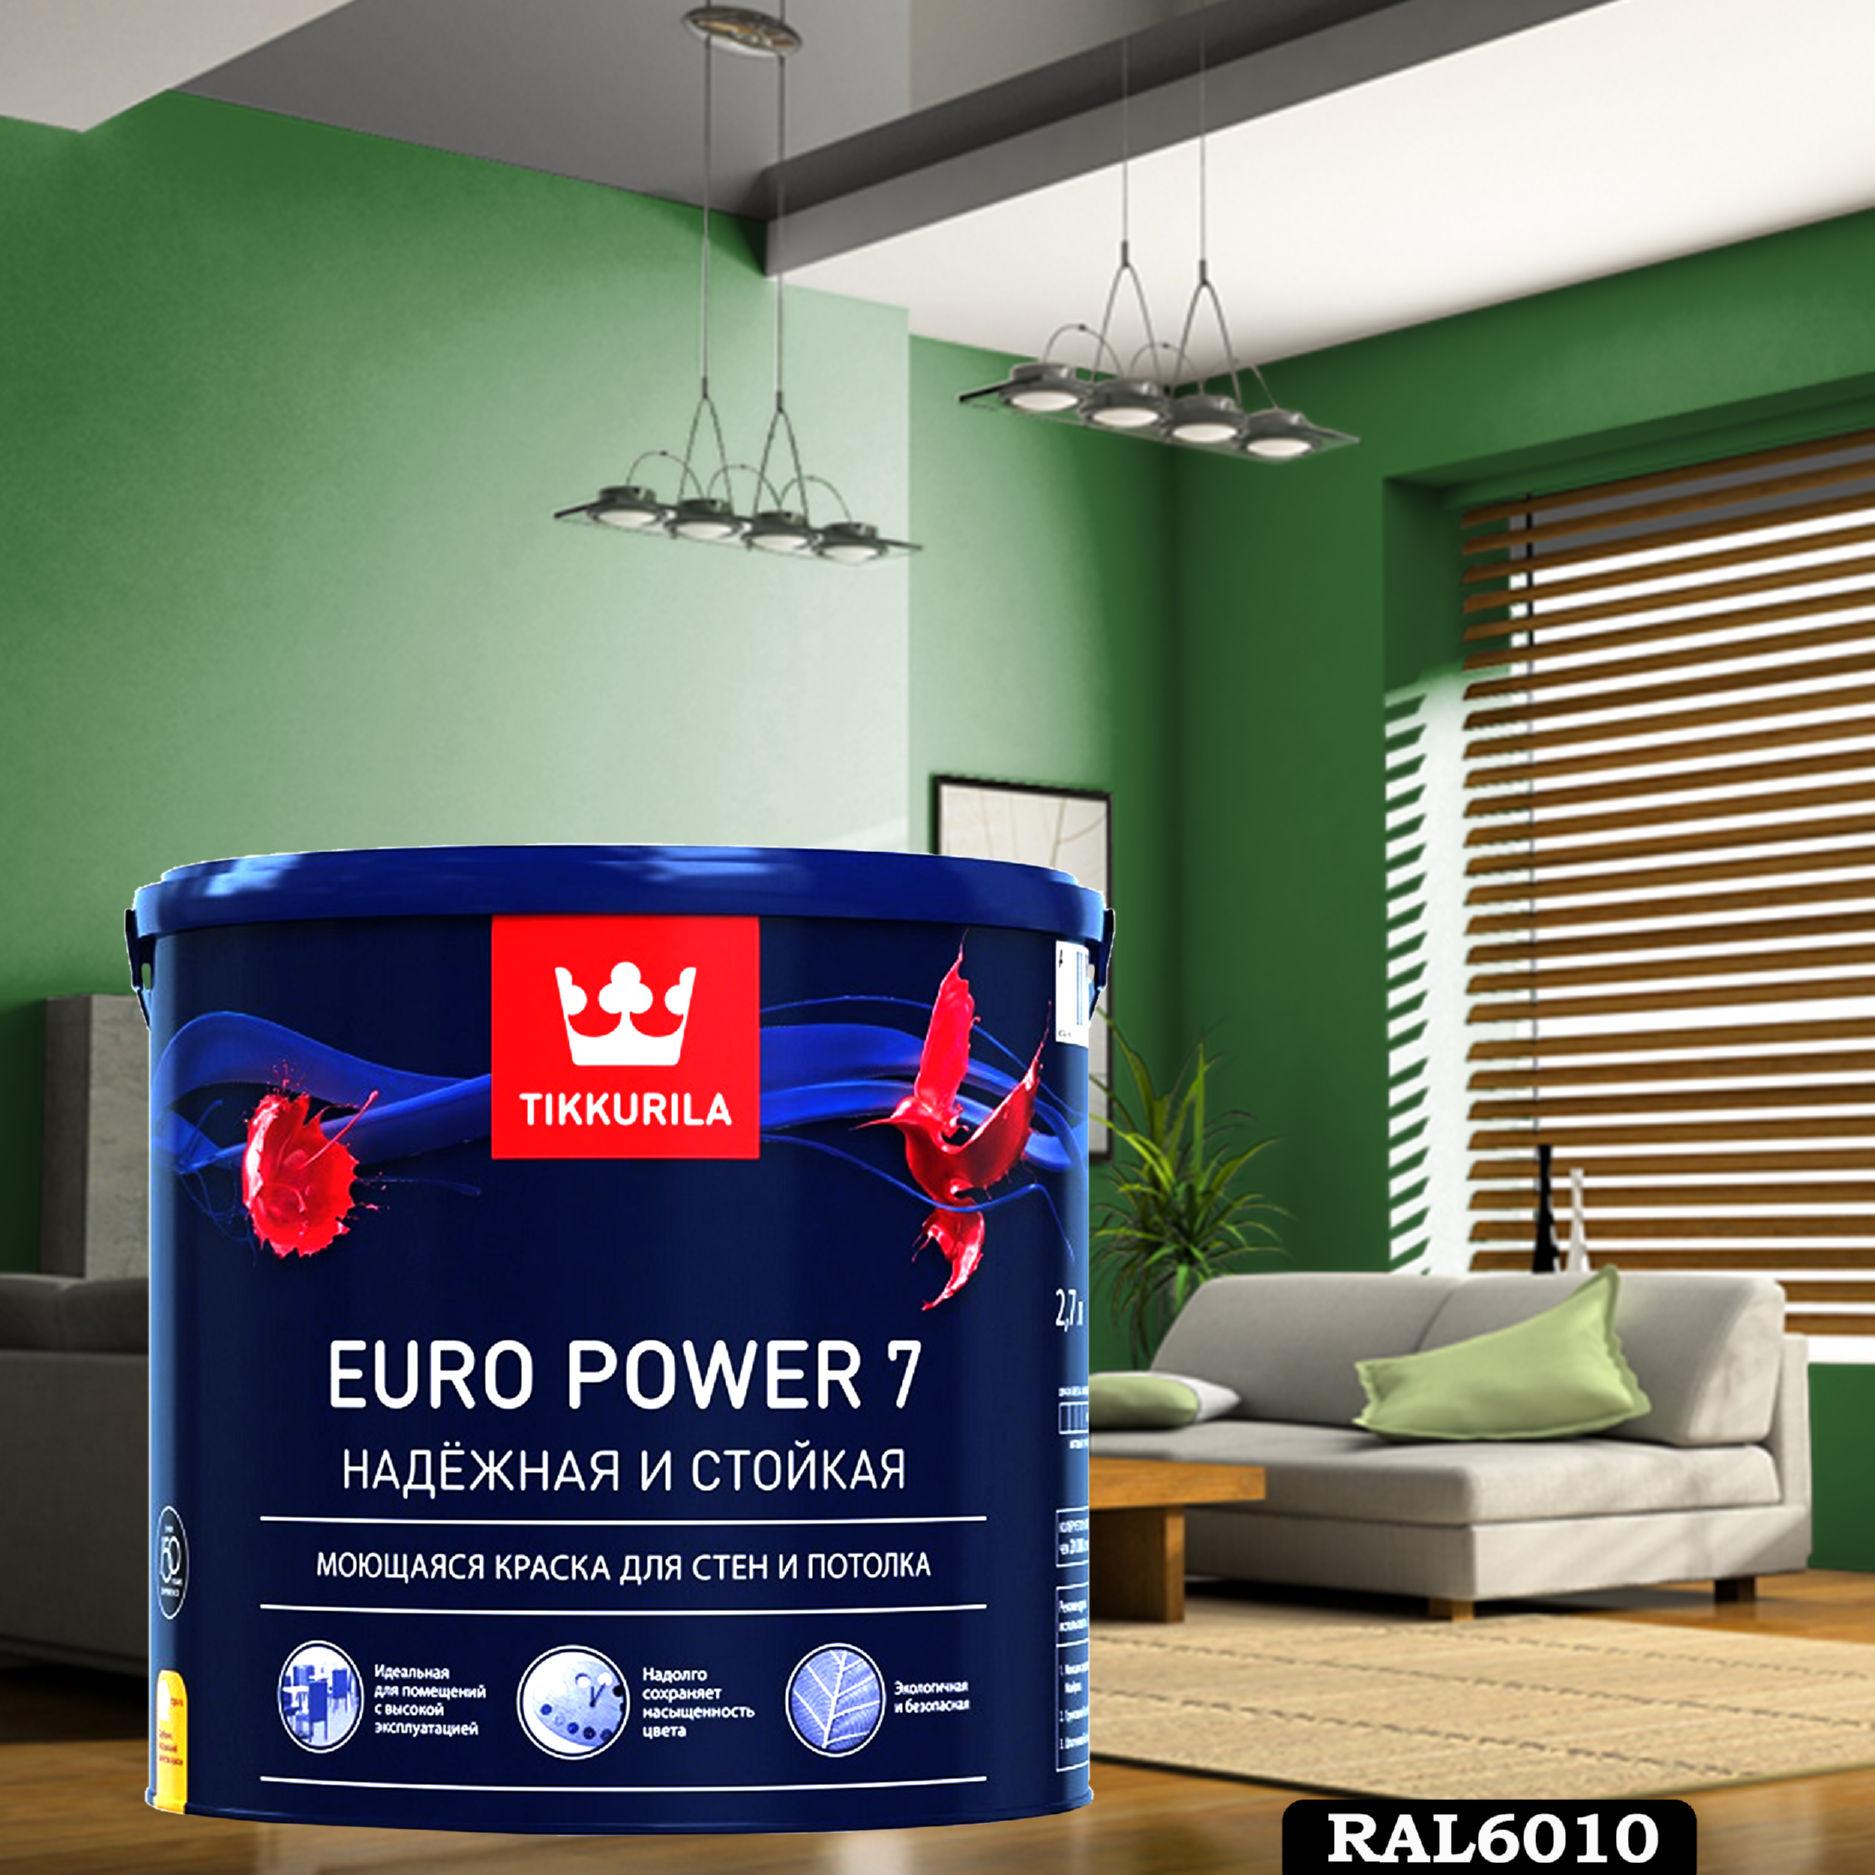 Фото 11 - Краска TIKKURILA Euro Power 7,  RAL 6010 Зеленая-трава, латексная моющаяся матовая интерьерная, 9 л.